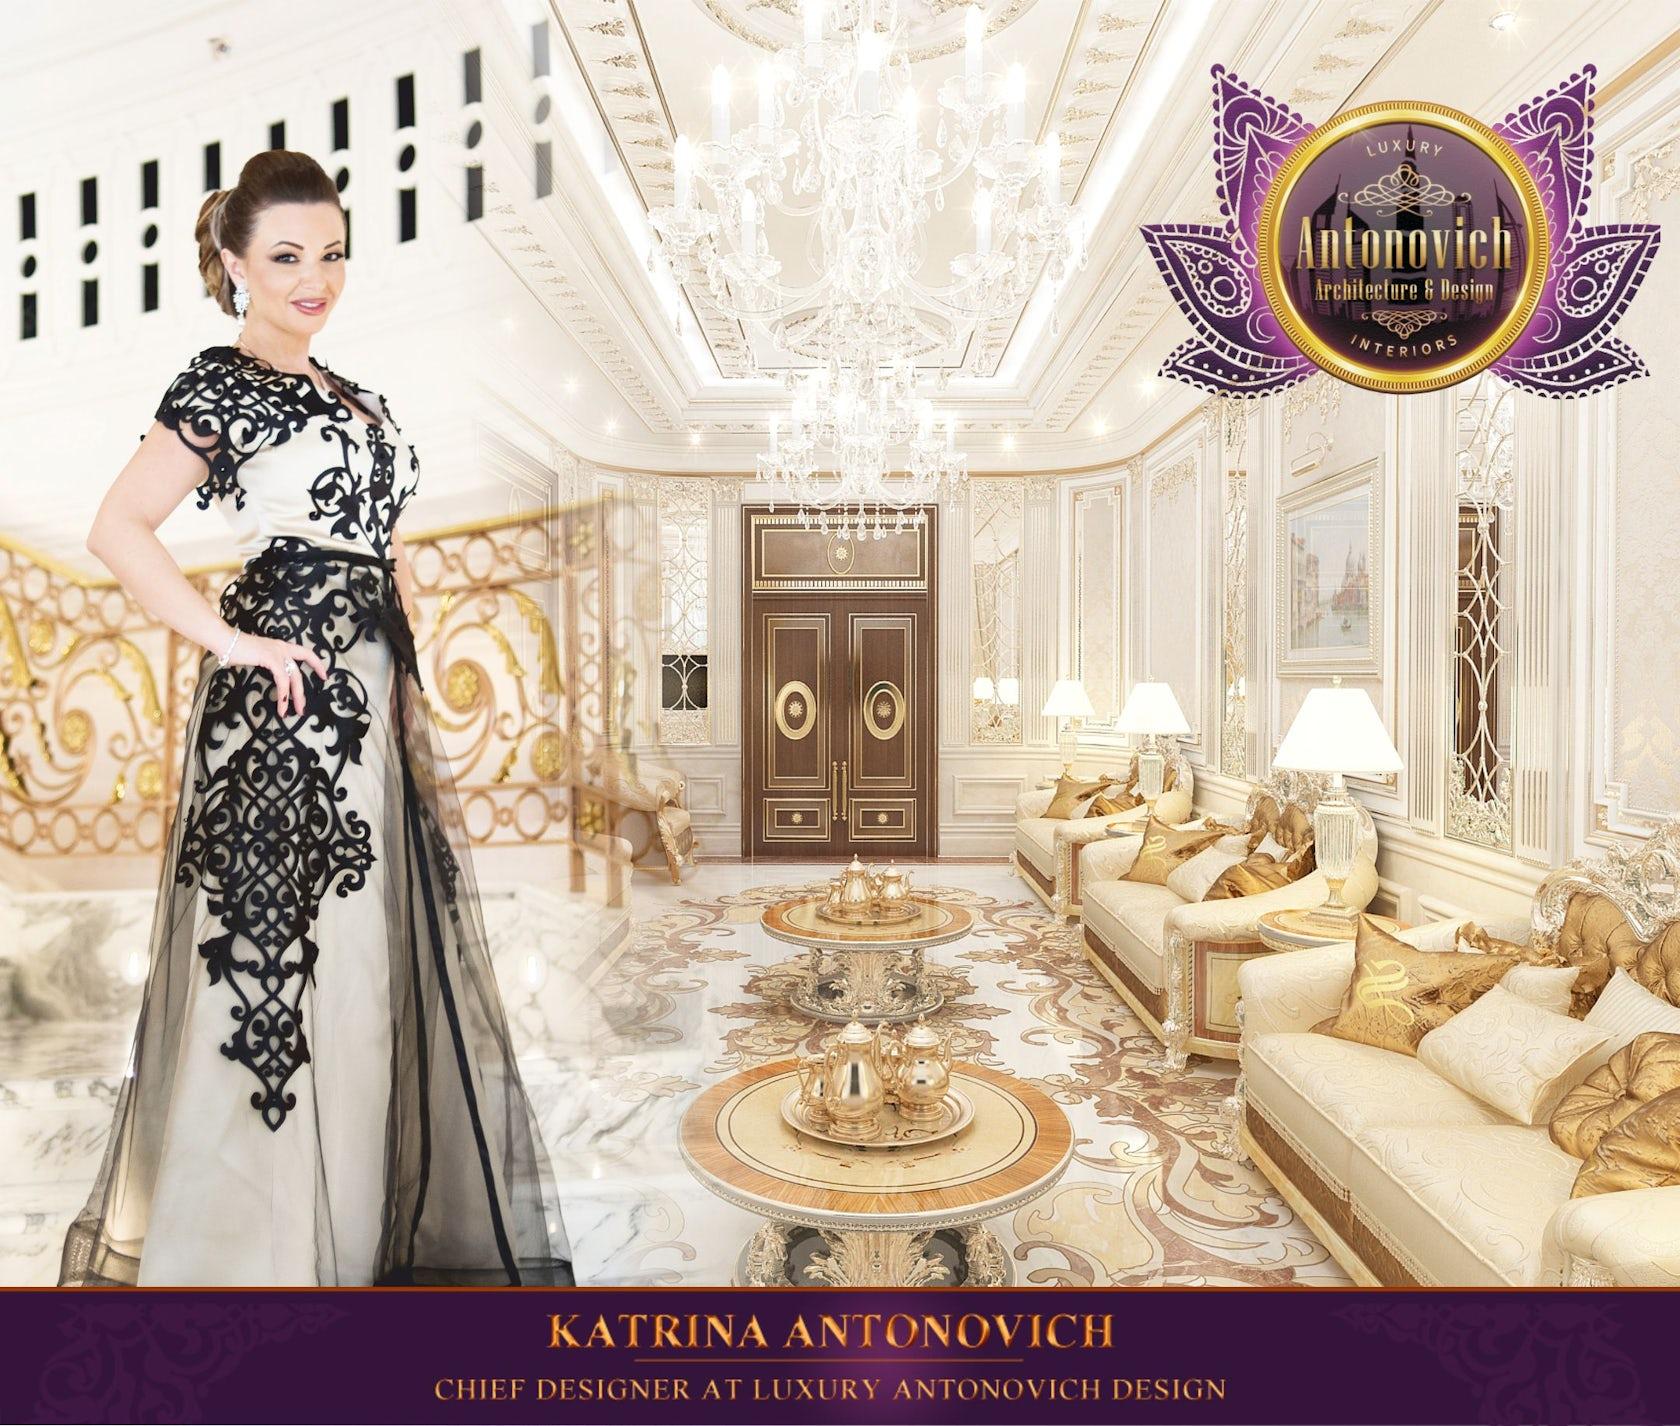 Katrina Antonovich Luxury Interior Design: Living Room Interior Design By LUXURY ANTONOVICH DESIGN